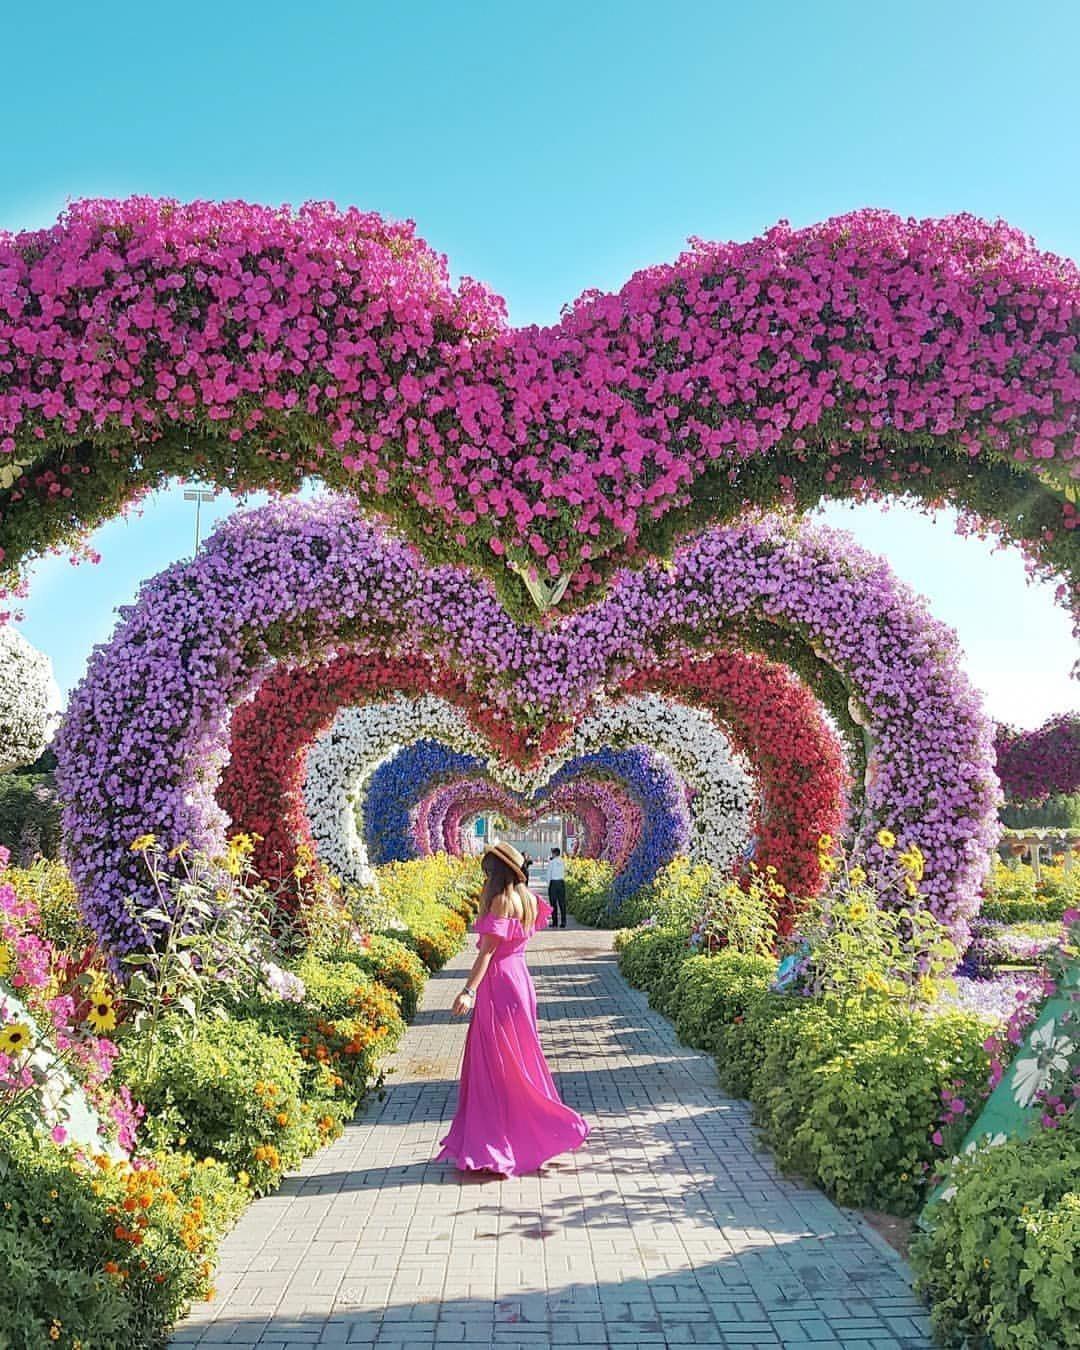 Organic Gardening Auburn Refferal 3010858645 GardenSoil